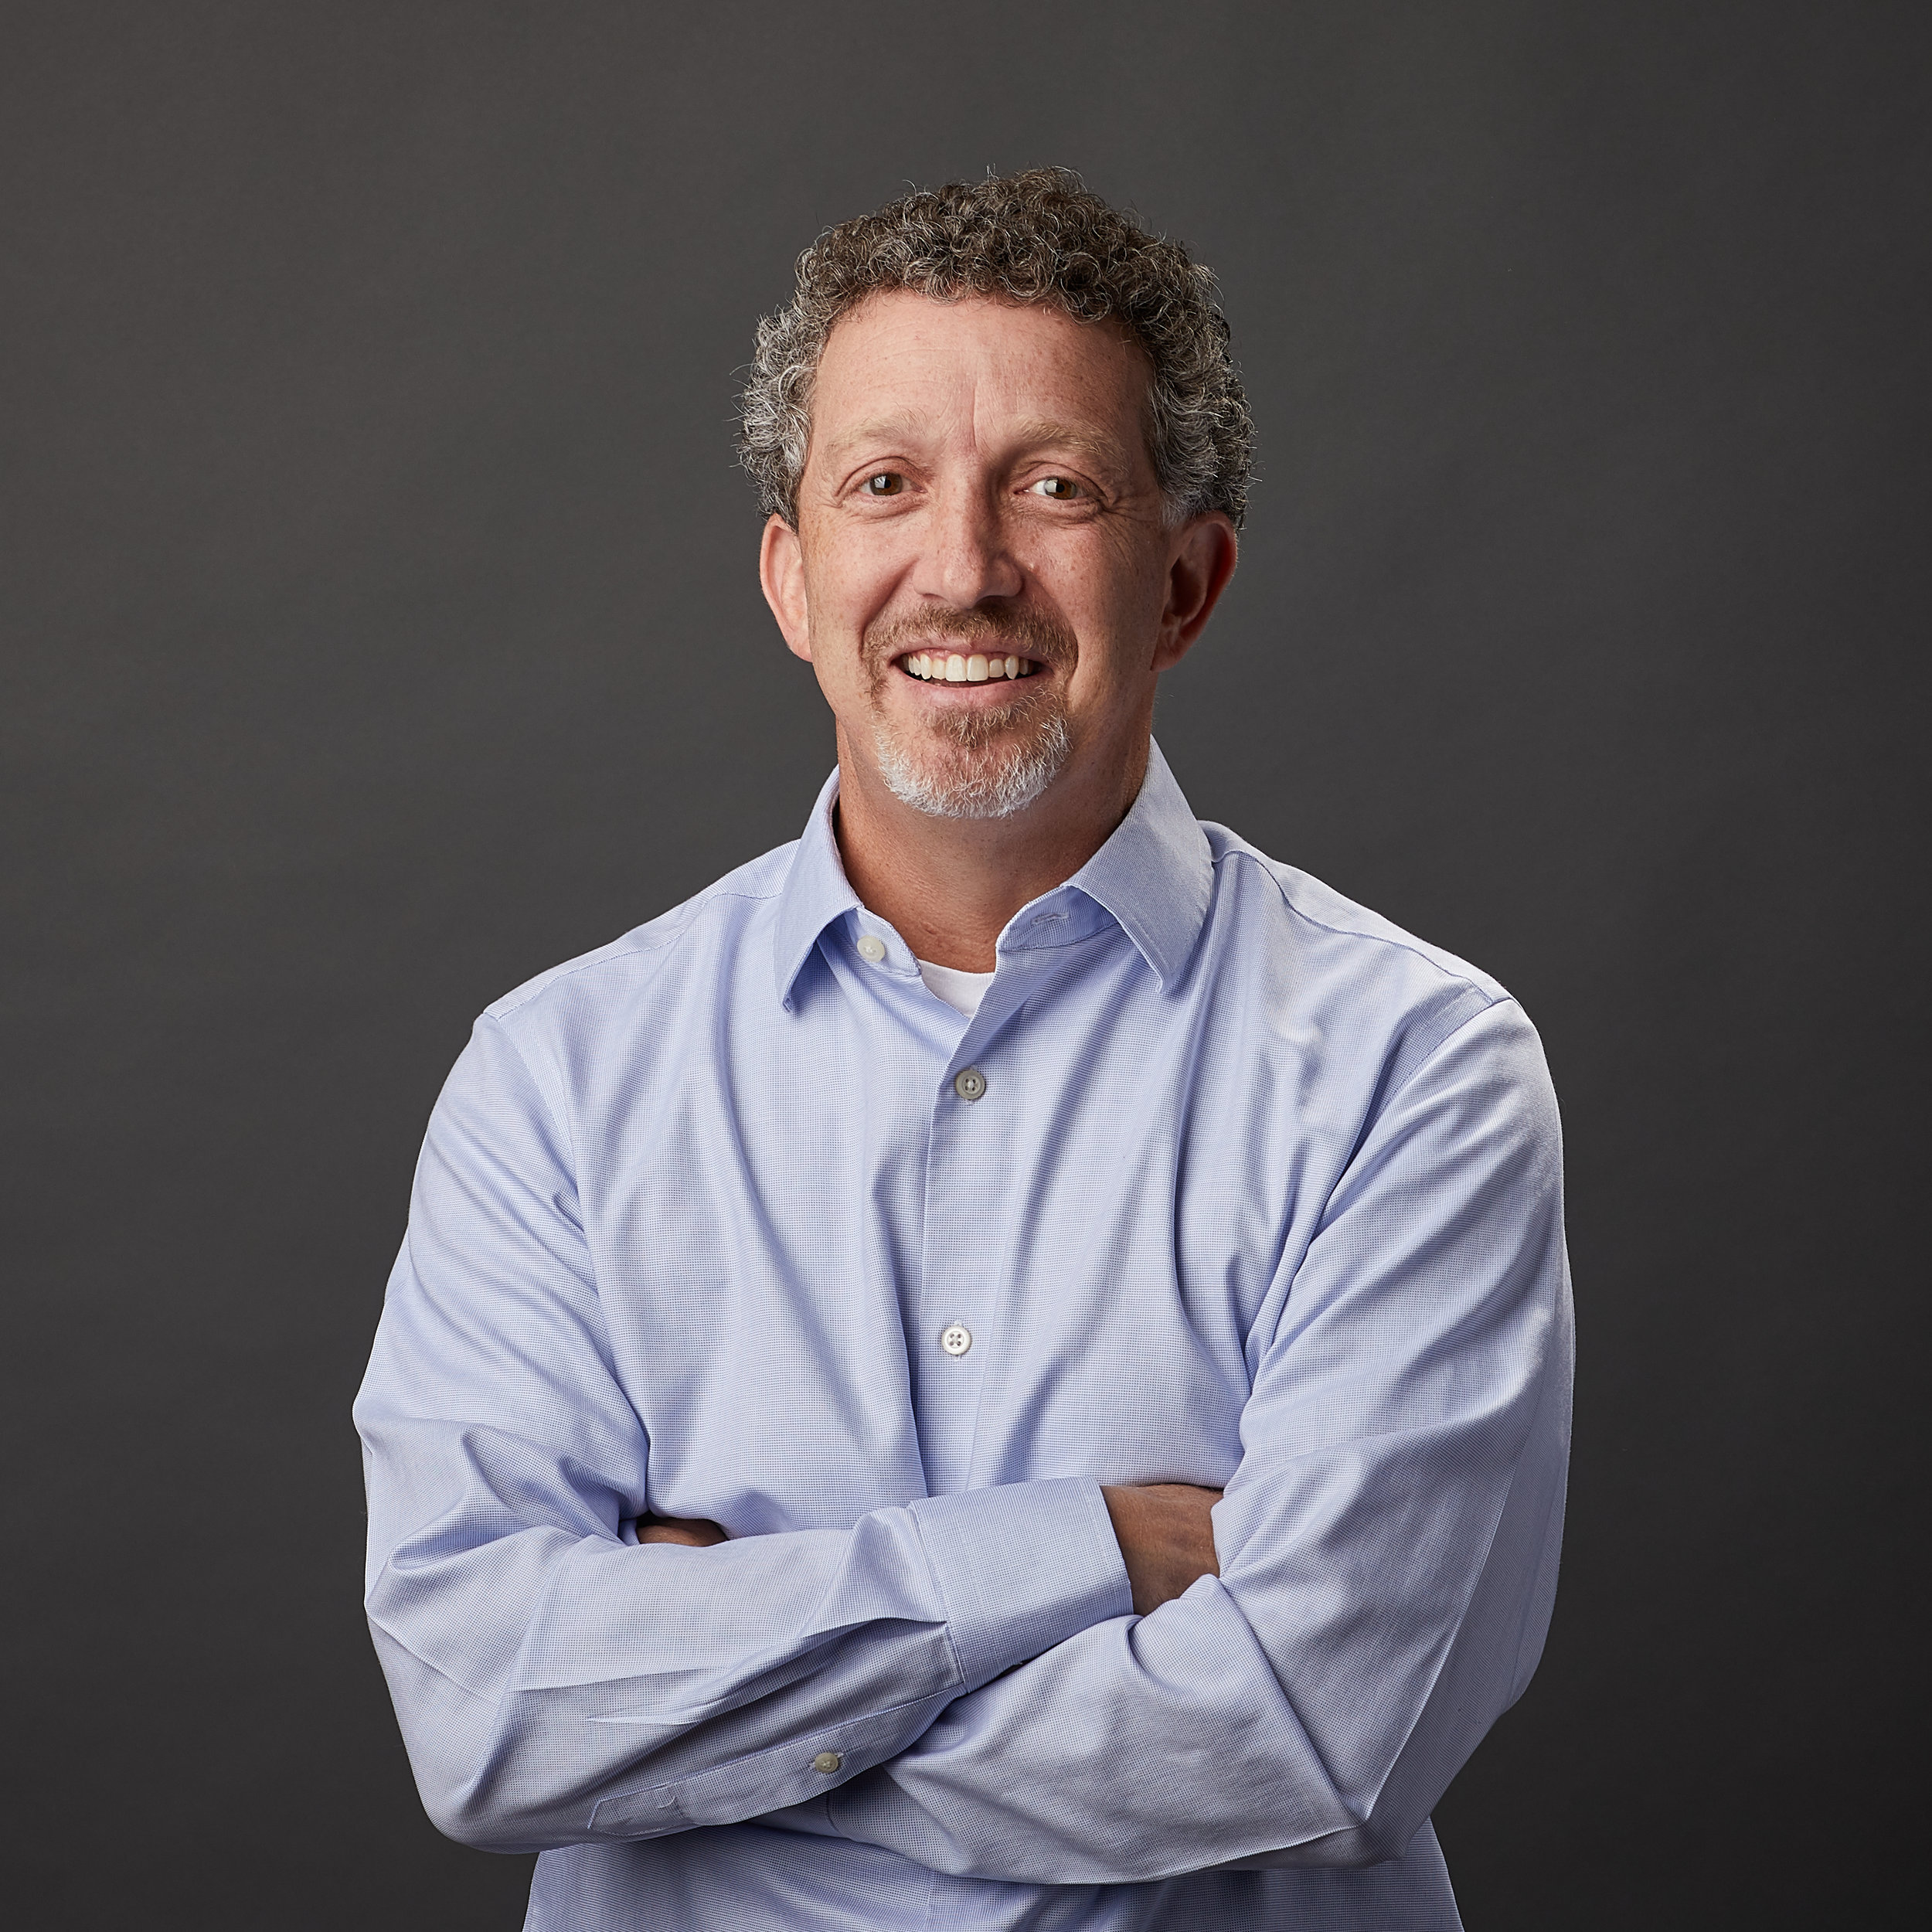 Andrew J. Erkis, PhD